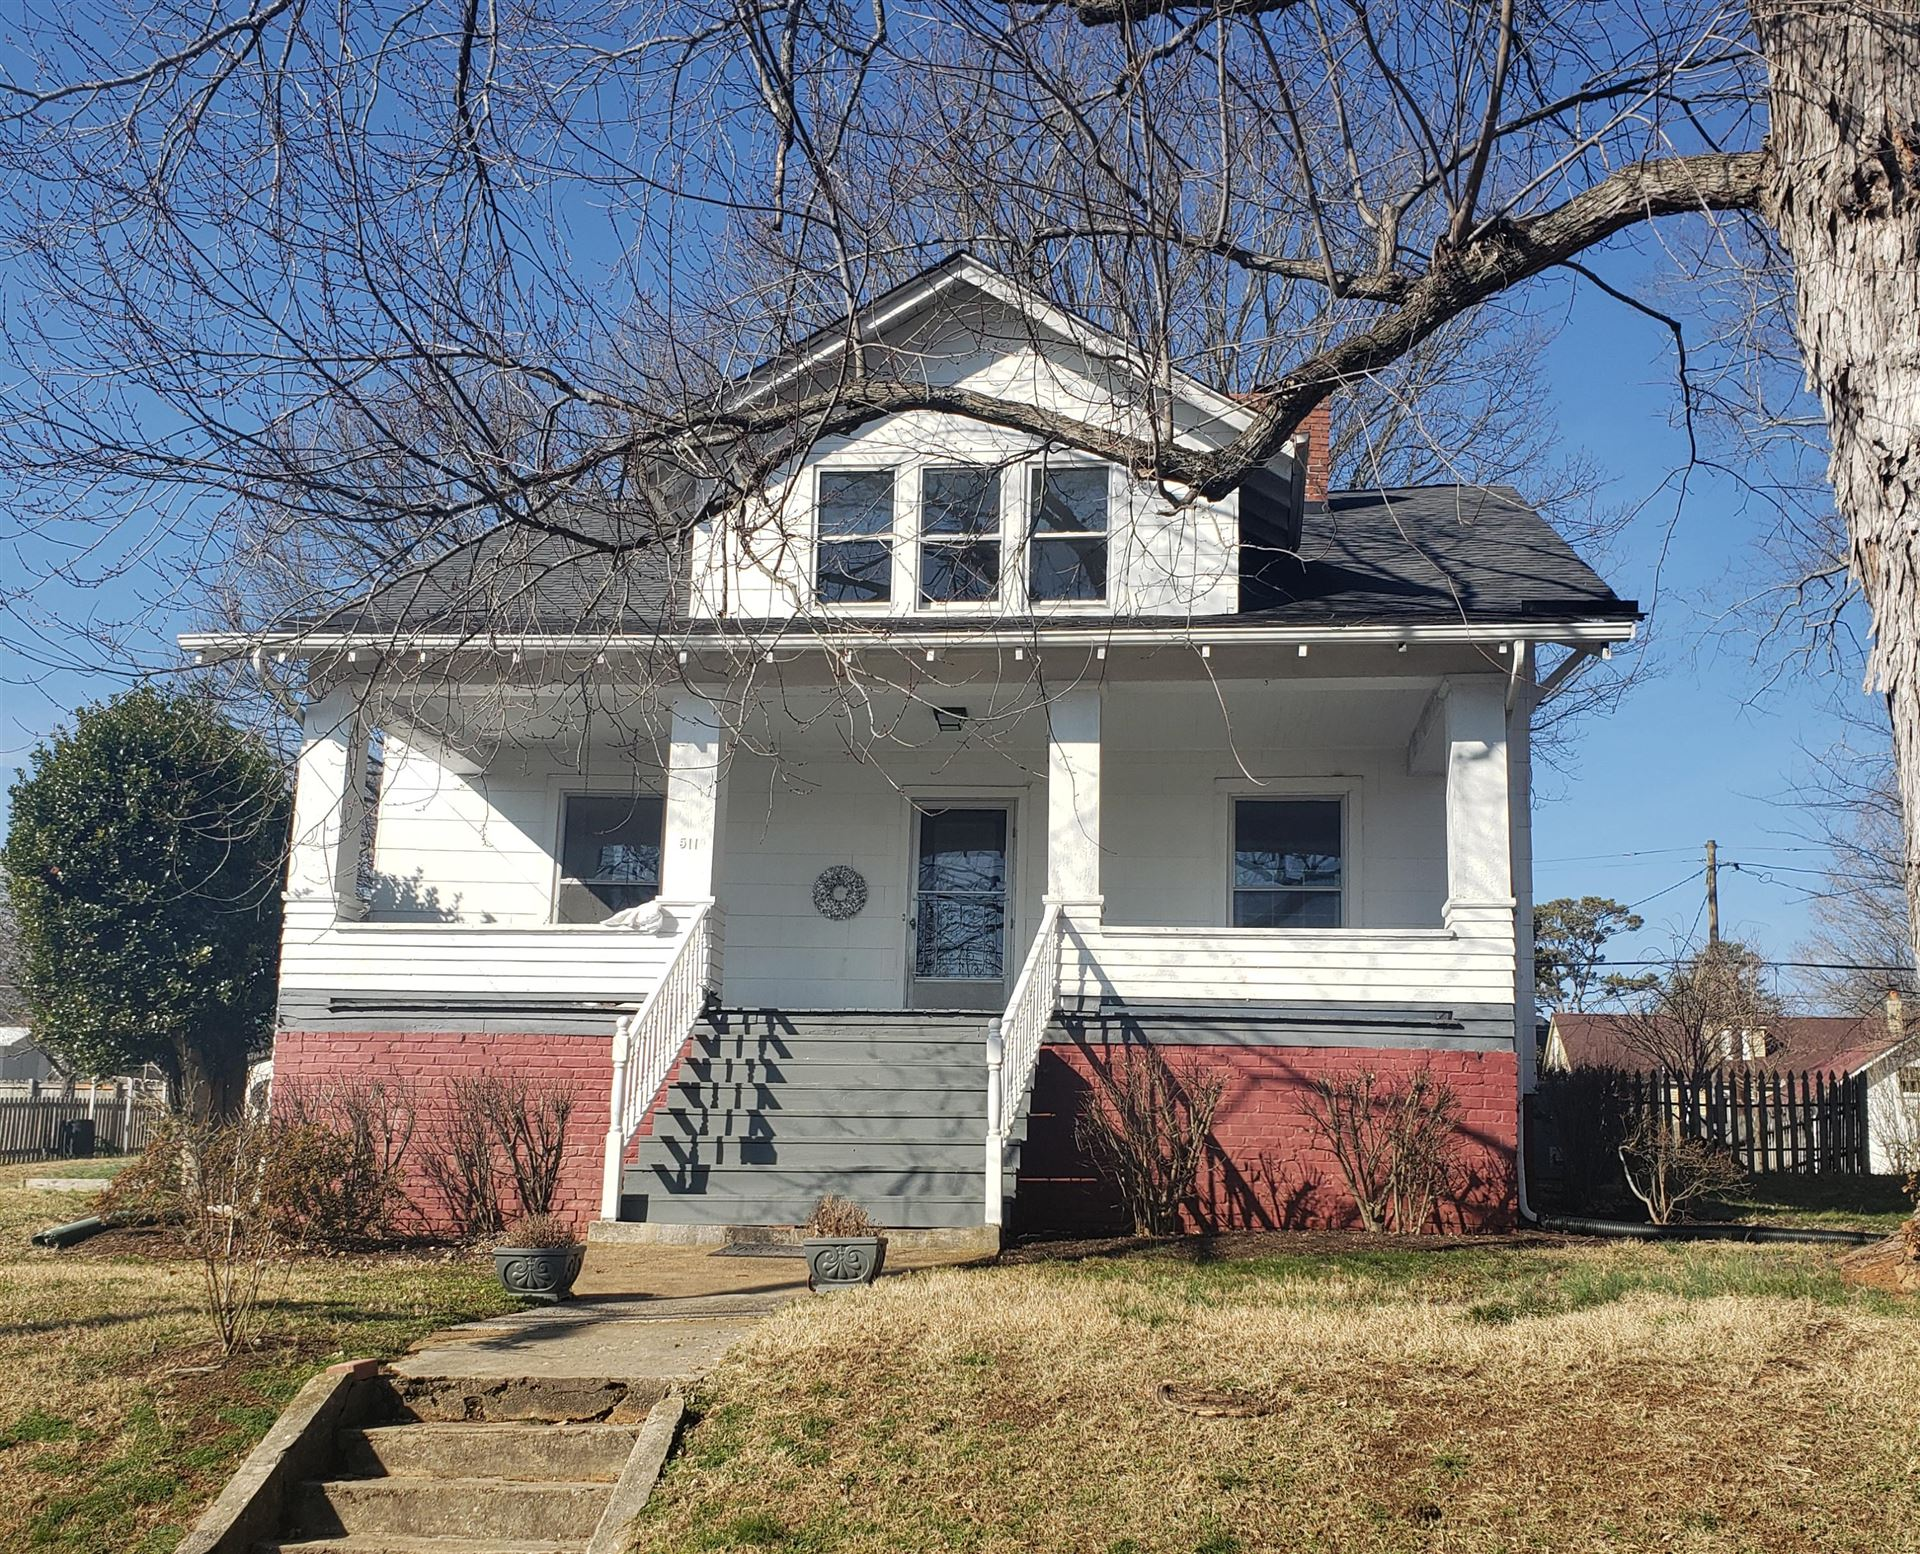 Photo of 511 NE Midlake Drive, Knoxville, TN 37918 (MLS # 1140113)